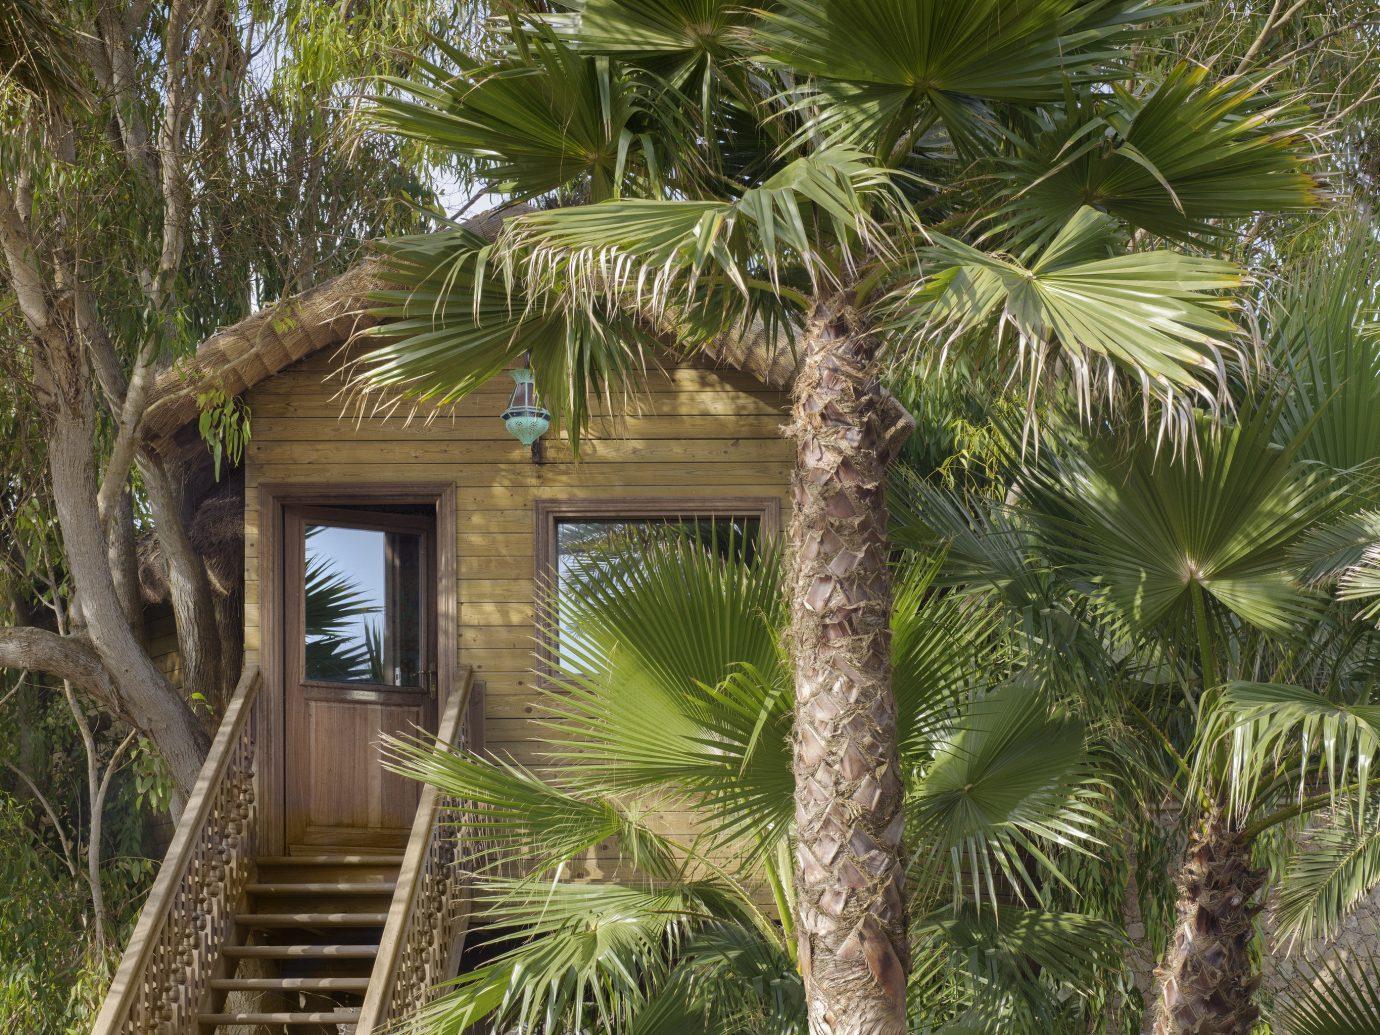 Hotels tree outdoor habitat palm property Resort botany plant Jungle arecales palm family land plant woody plant tropics rainforest home estate shade